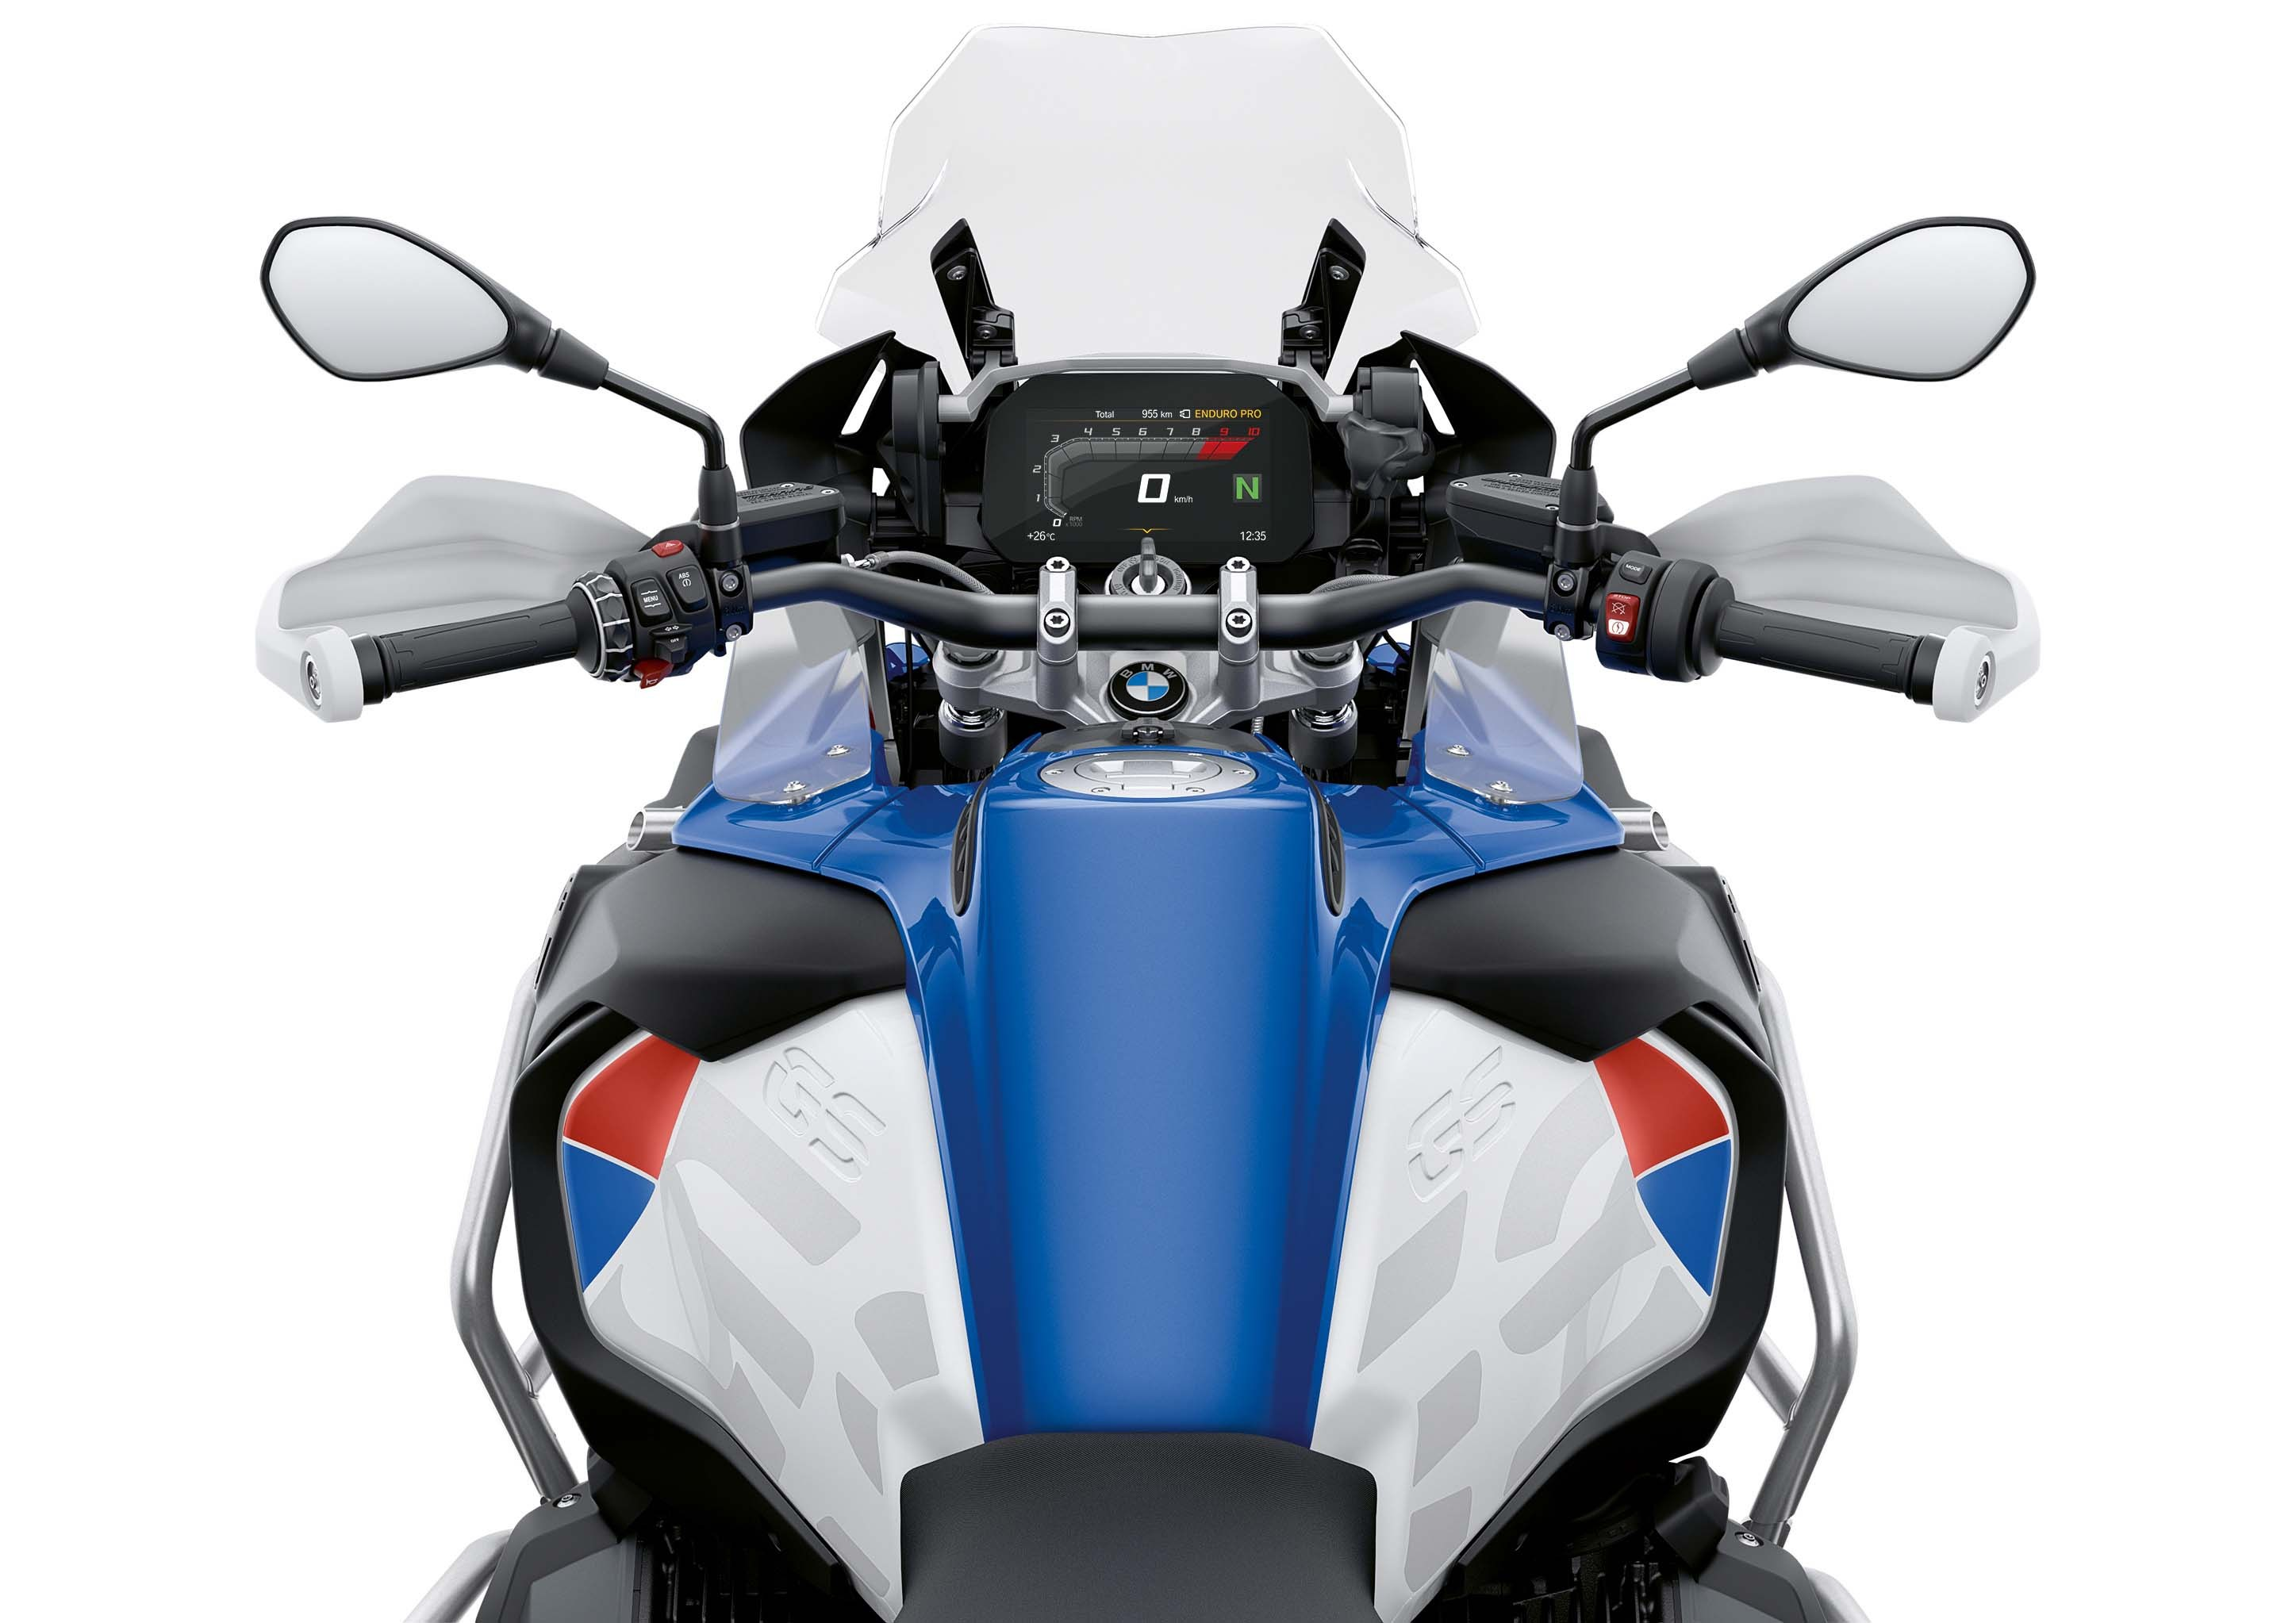 2019 Bmw R 1250 Gs Adventure Debuts With Shiftcam Engine Bikesrepublic